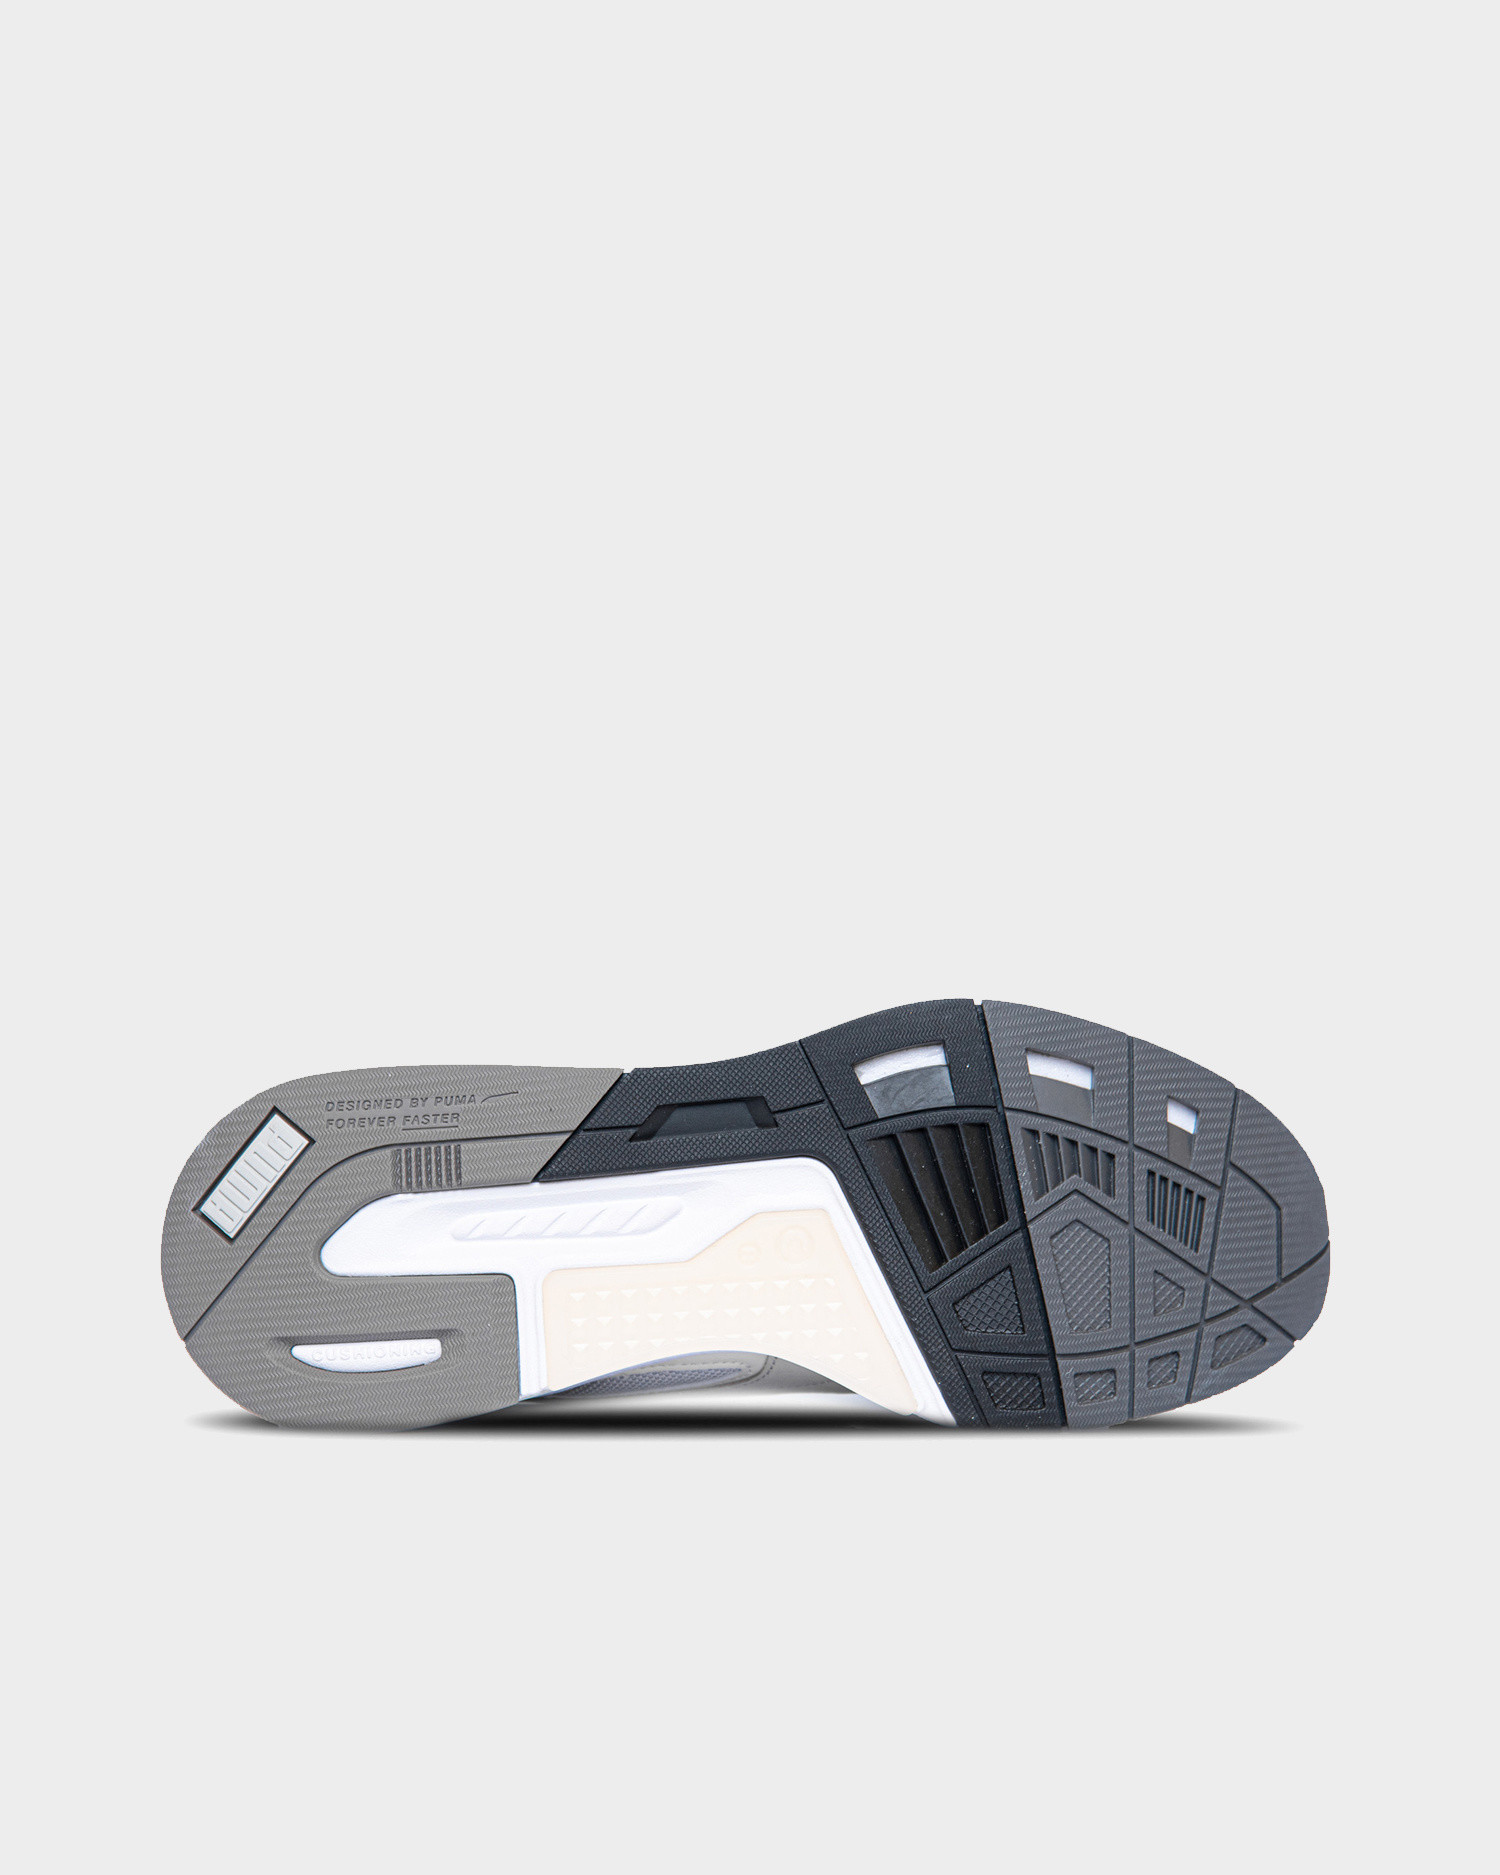 Puma Mirage Sport 1 Steel Gray-Gray Violet